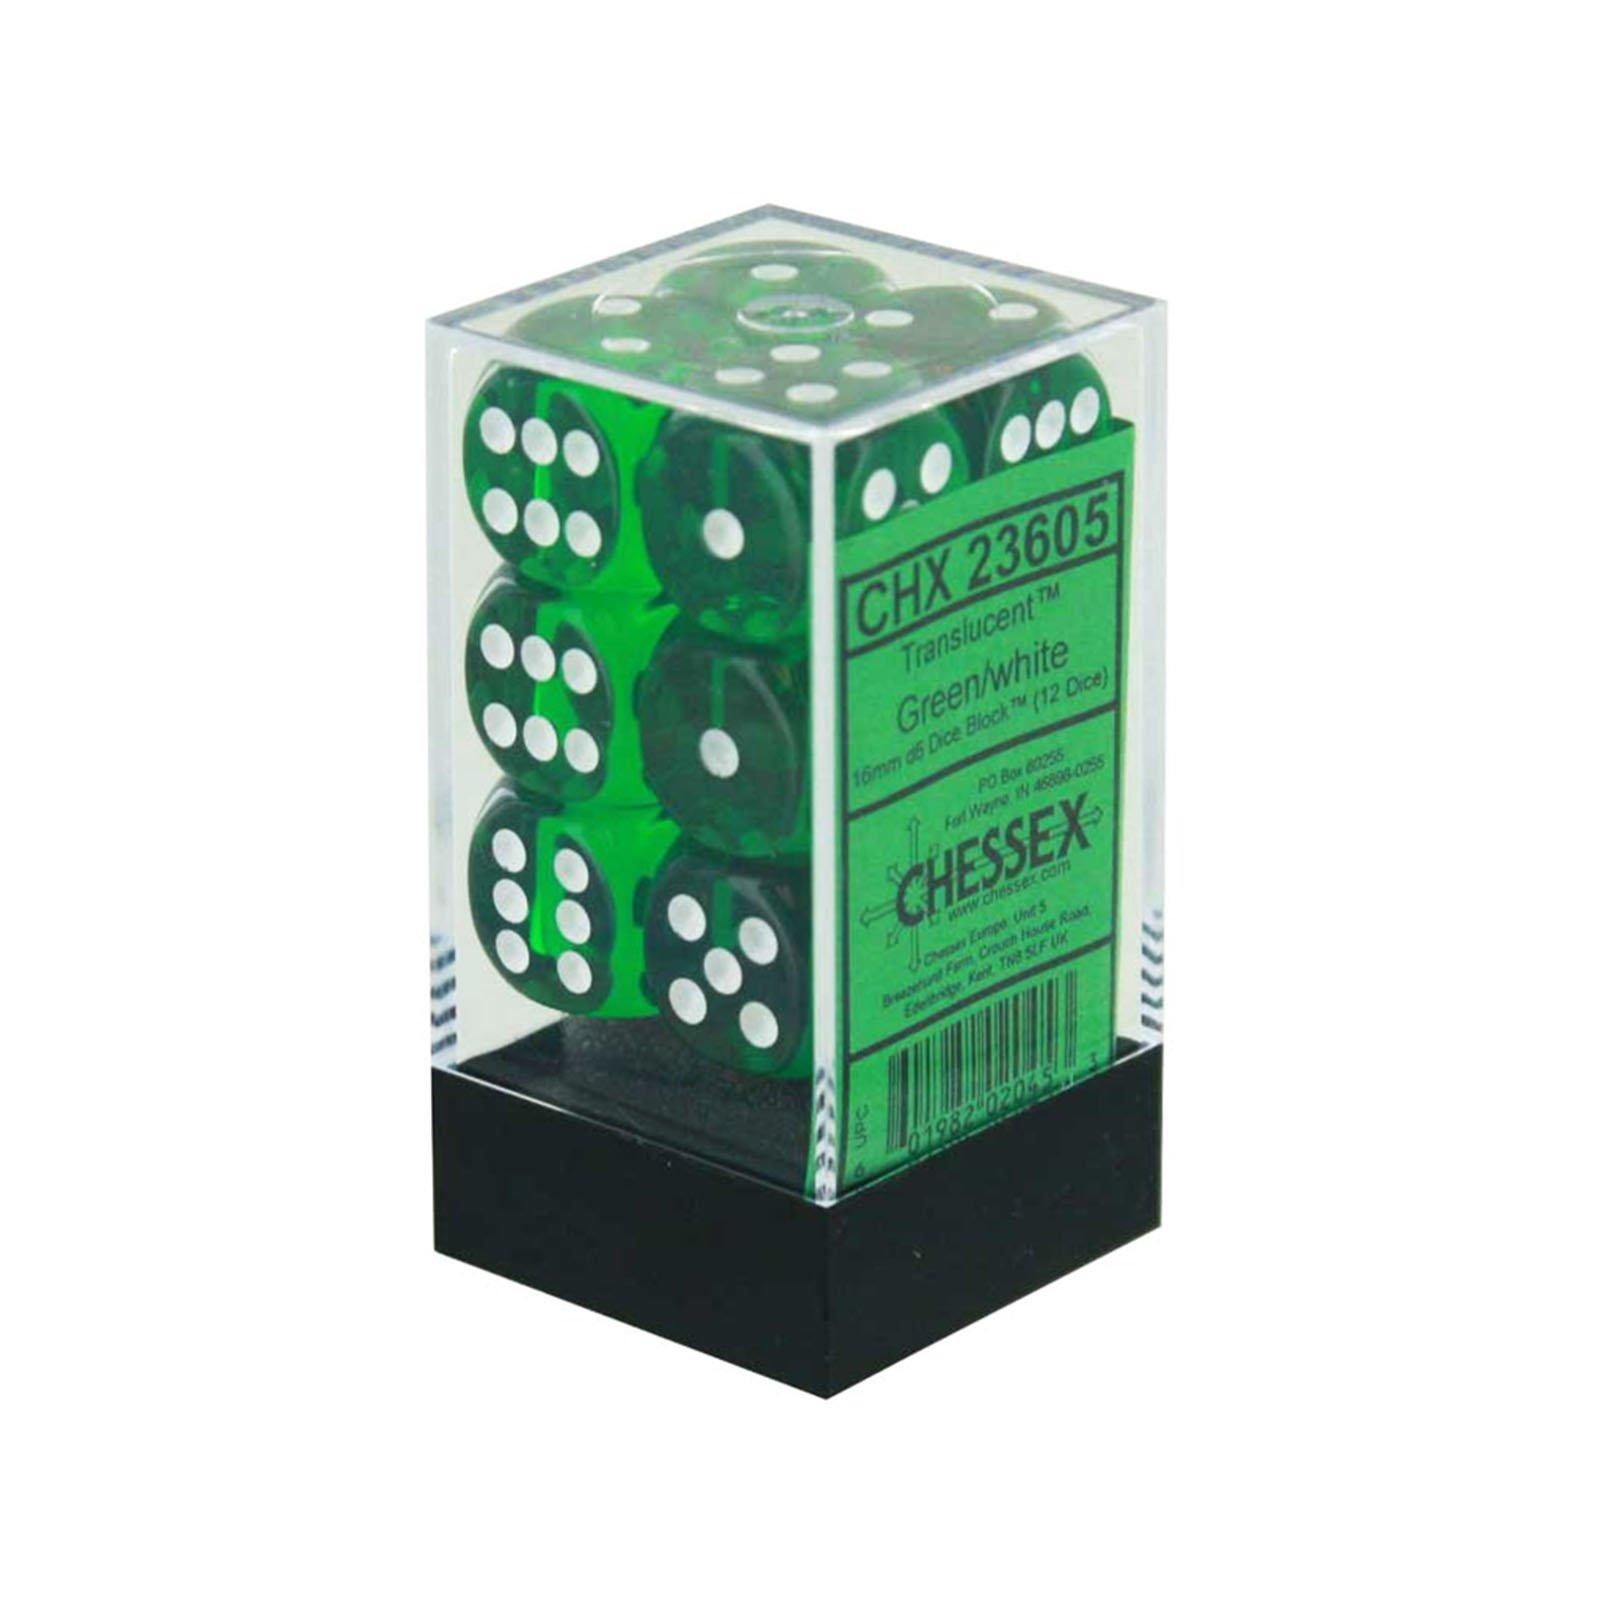 Caja D6 CHX 23605